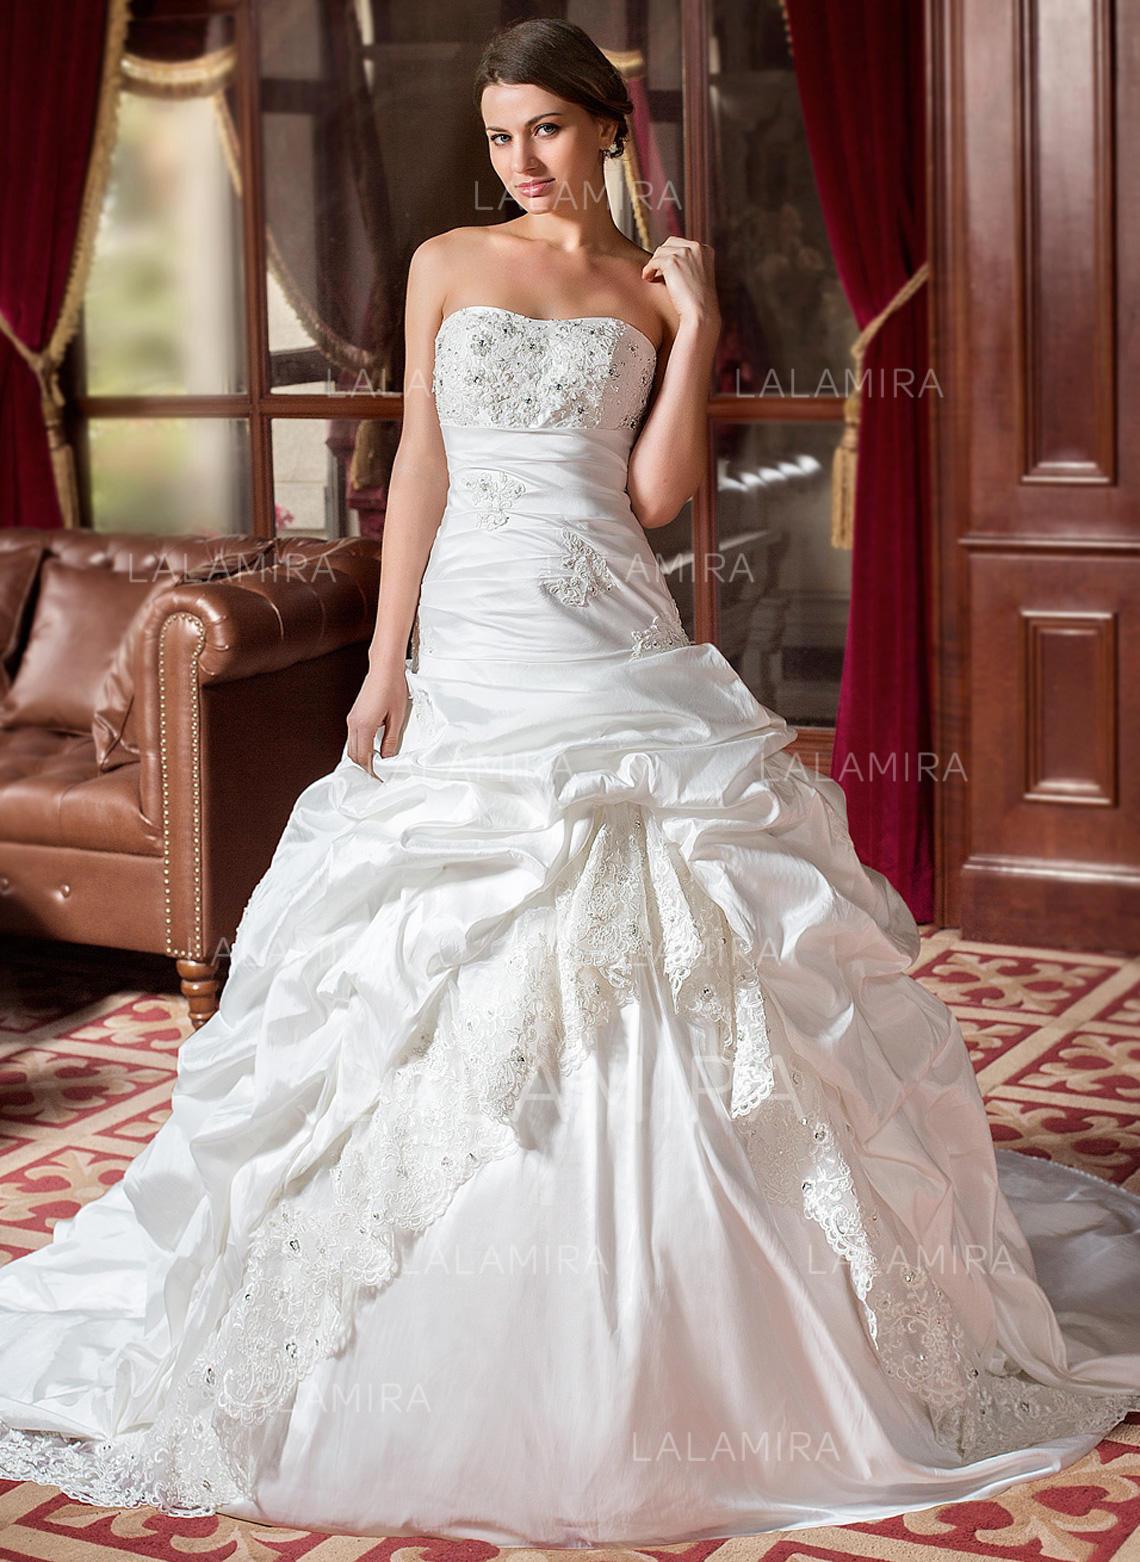 Modern Ballgown With Taffeta Wedding Dresses 002004436 Loading Zoom: Taffeta Ball Gown Wedding Dresses At Websimilar.org